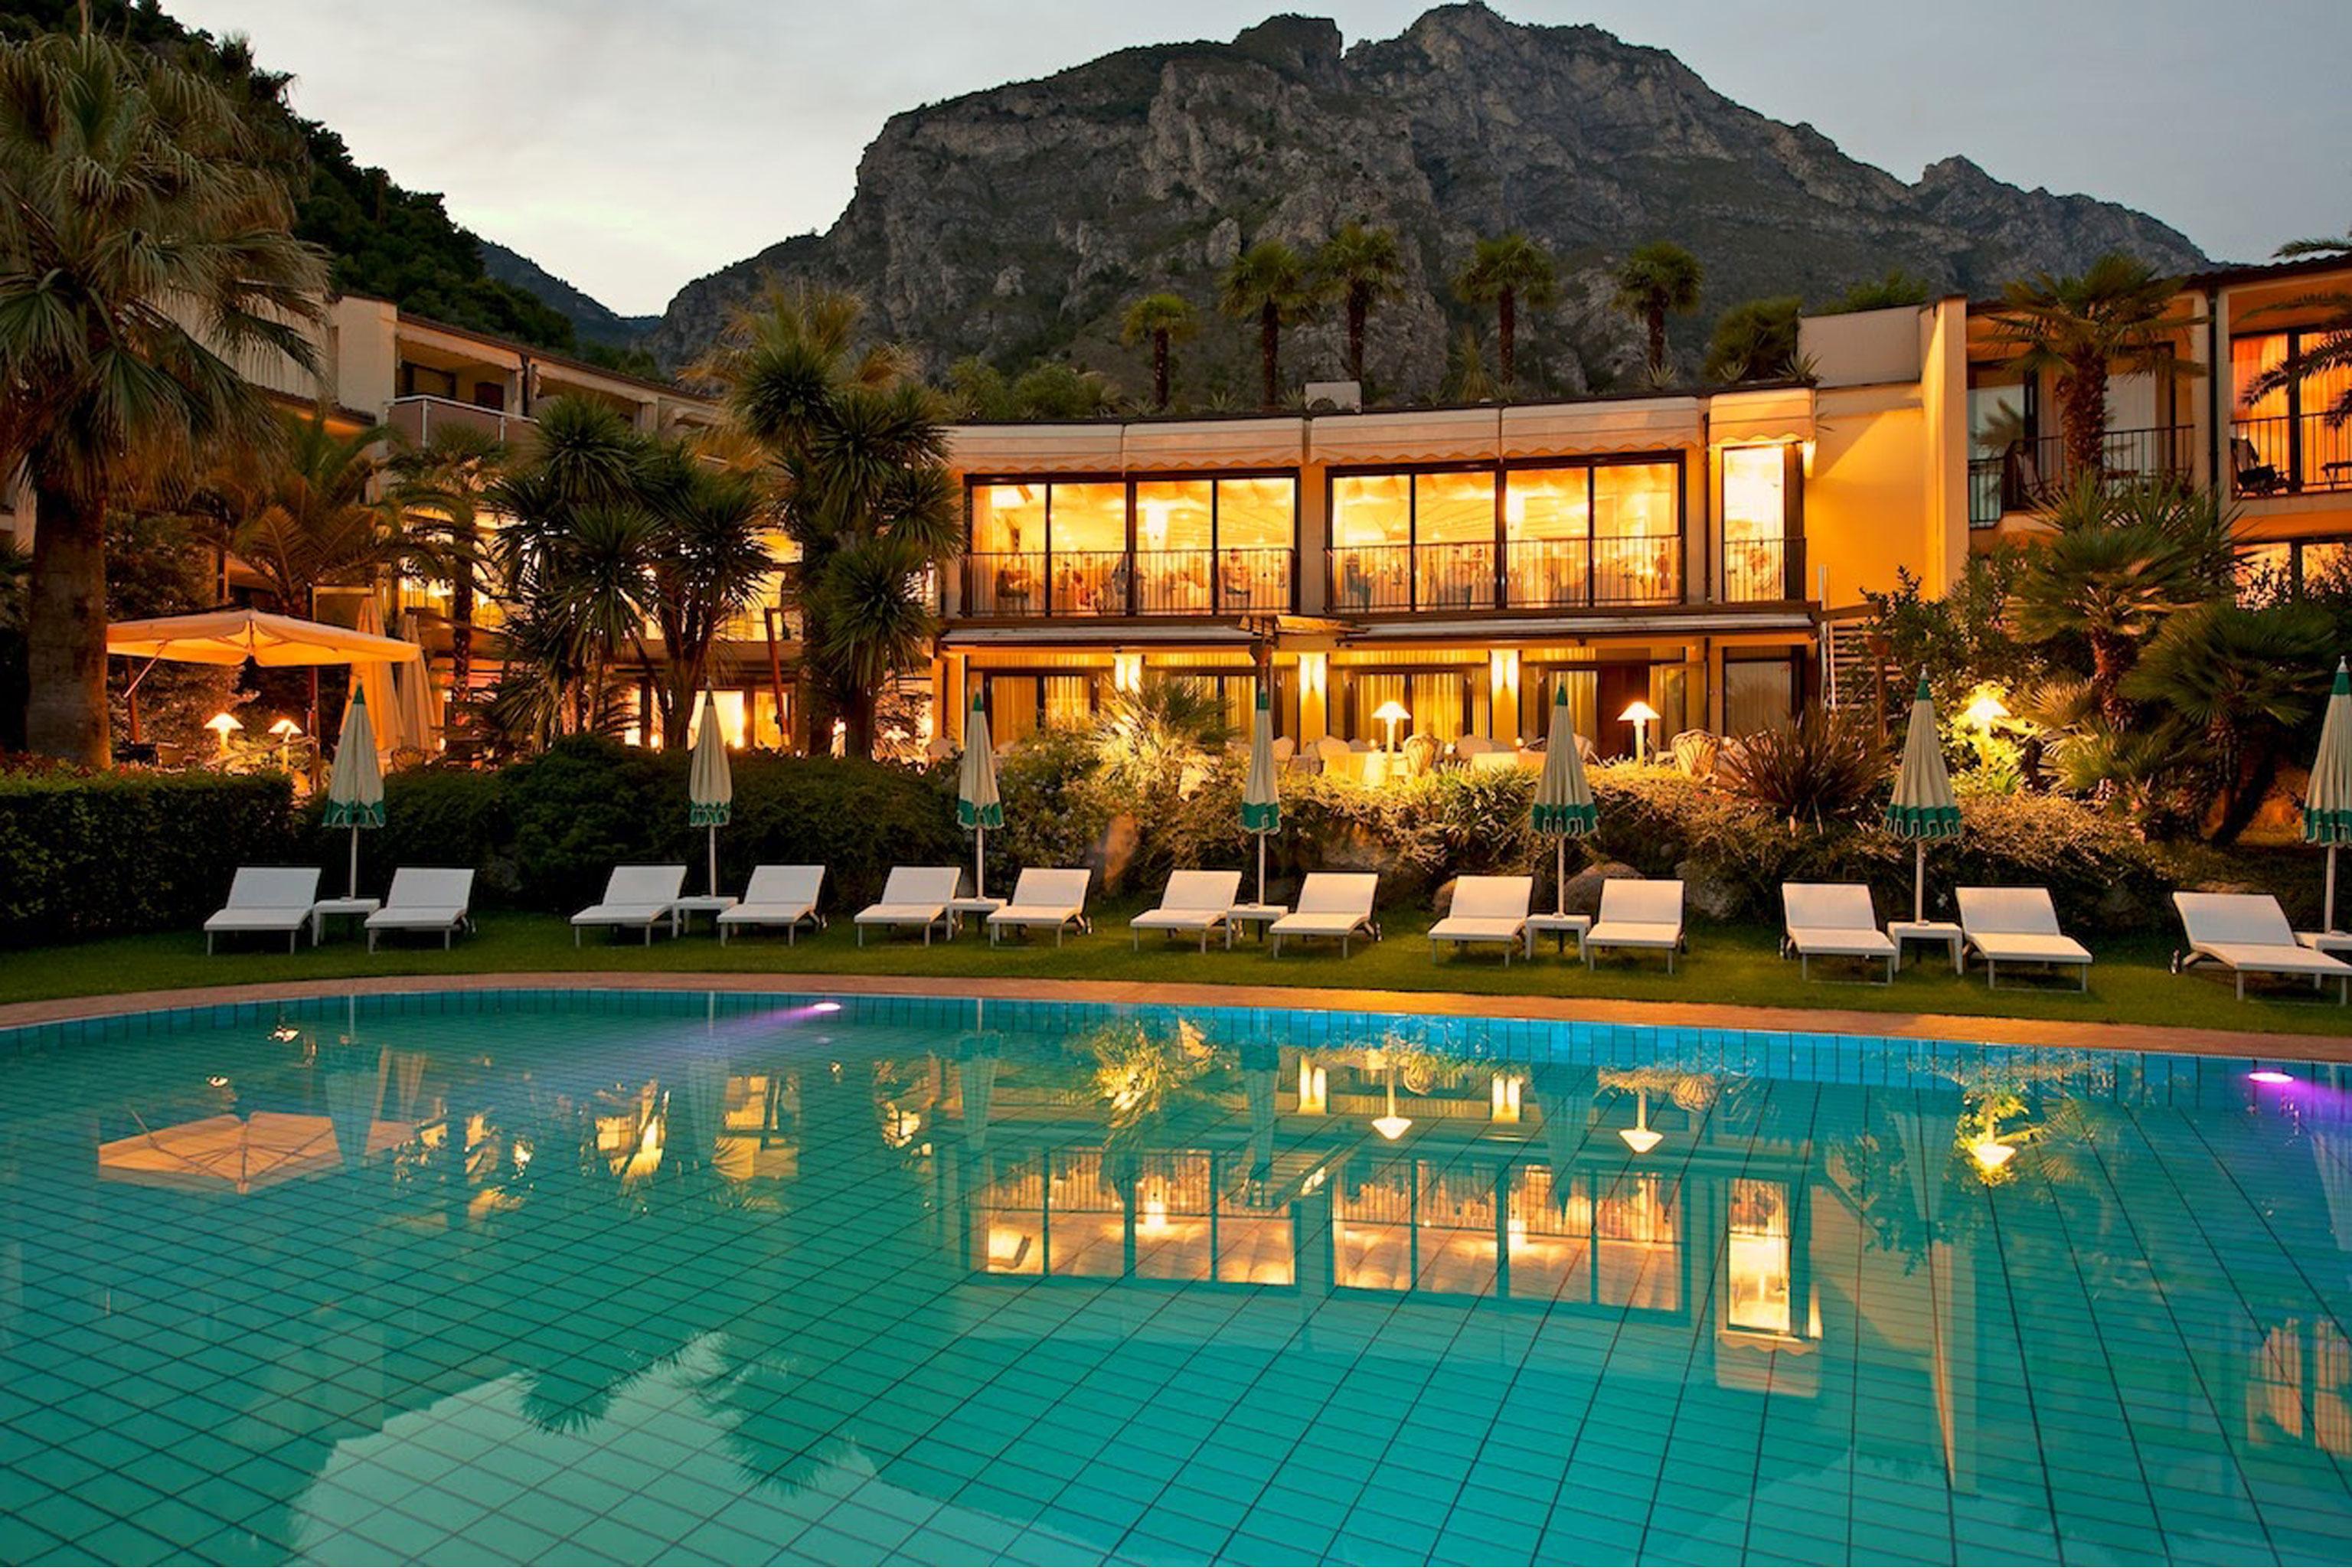 Hotel Park Imperial Limone Sul Garda